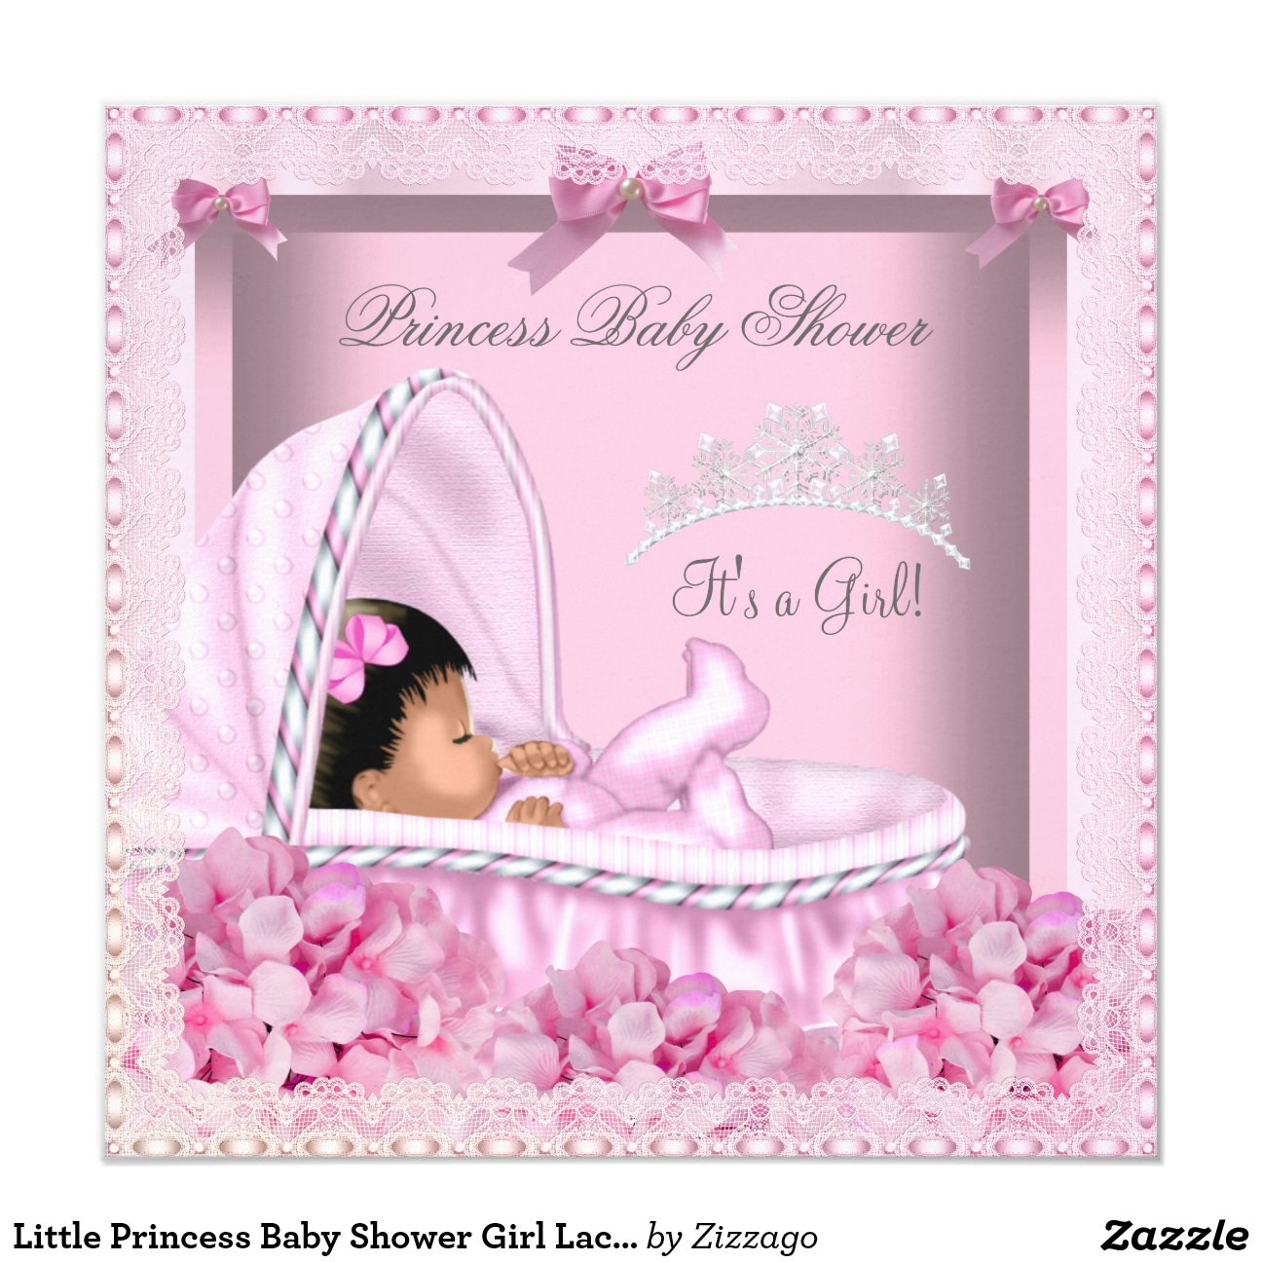 Baby shower invitation ideas pinterest